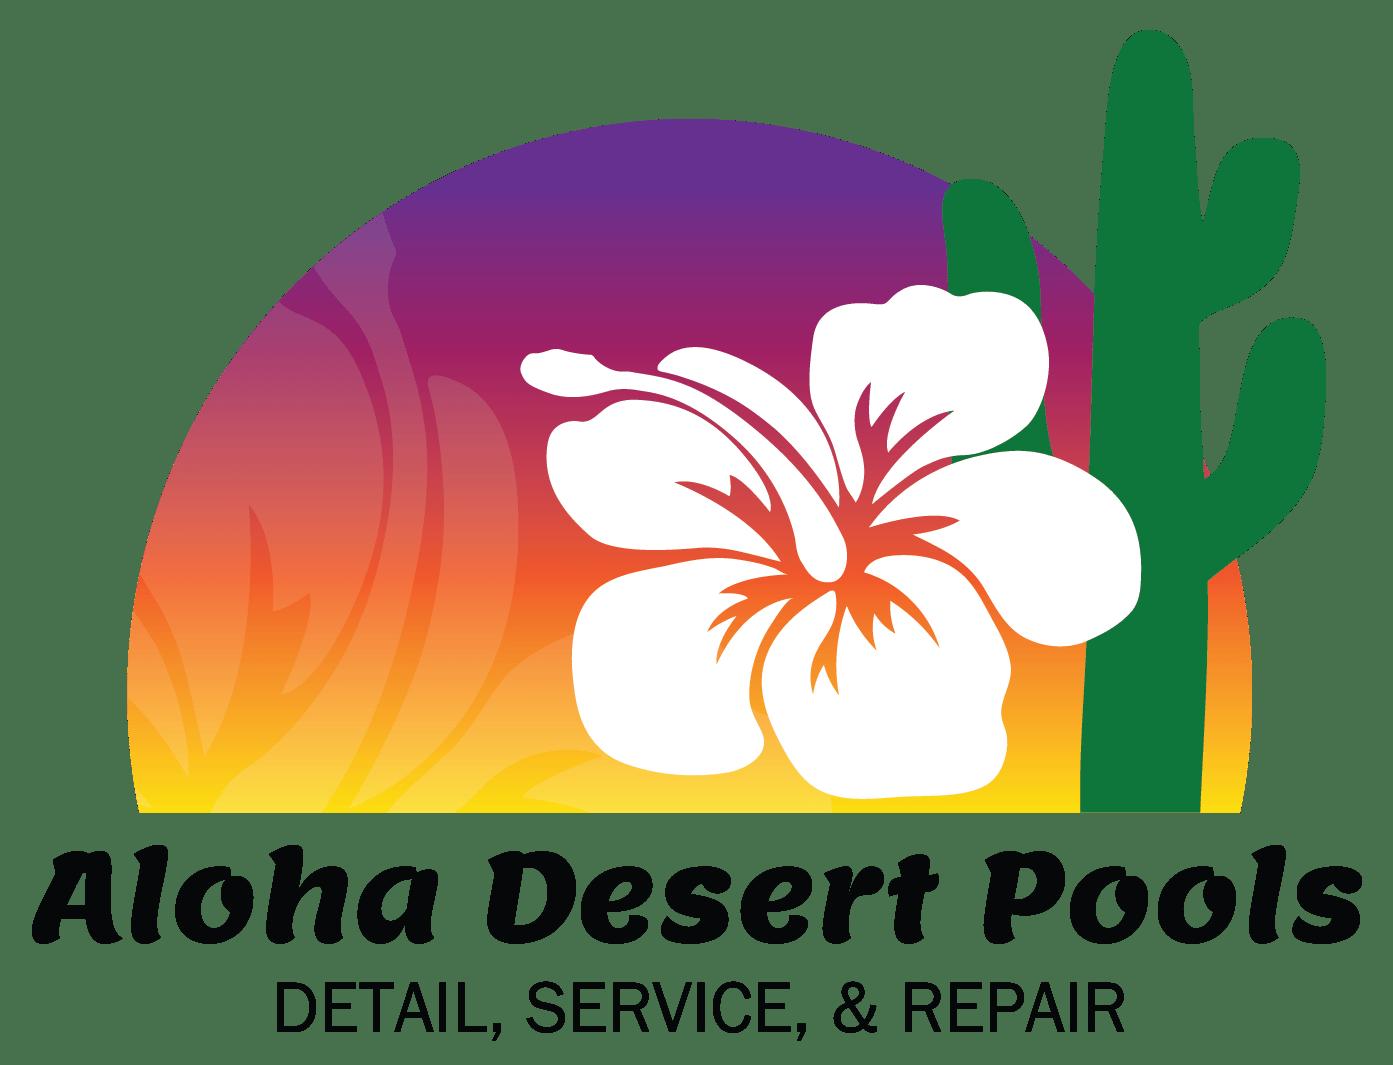 Aloha Desert Pools